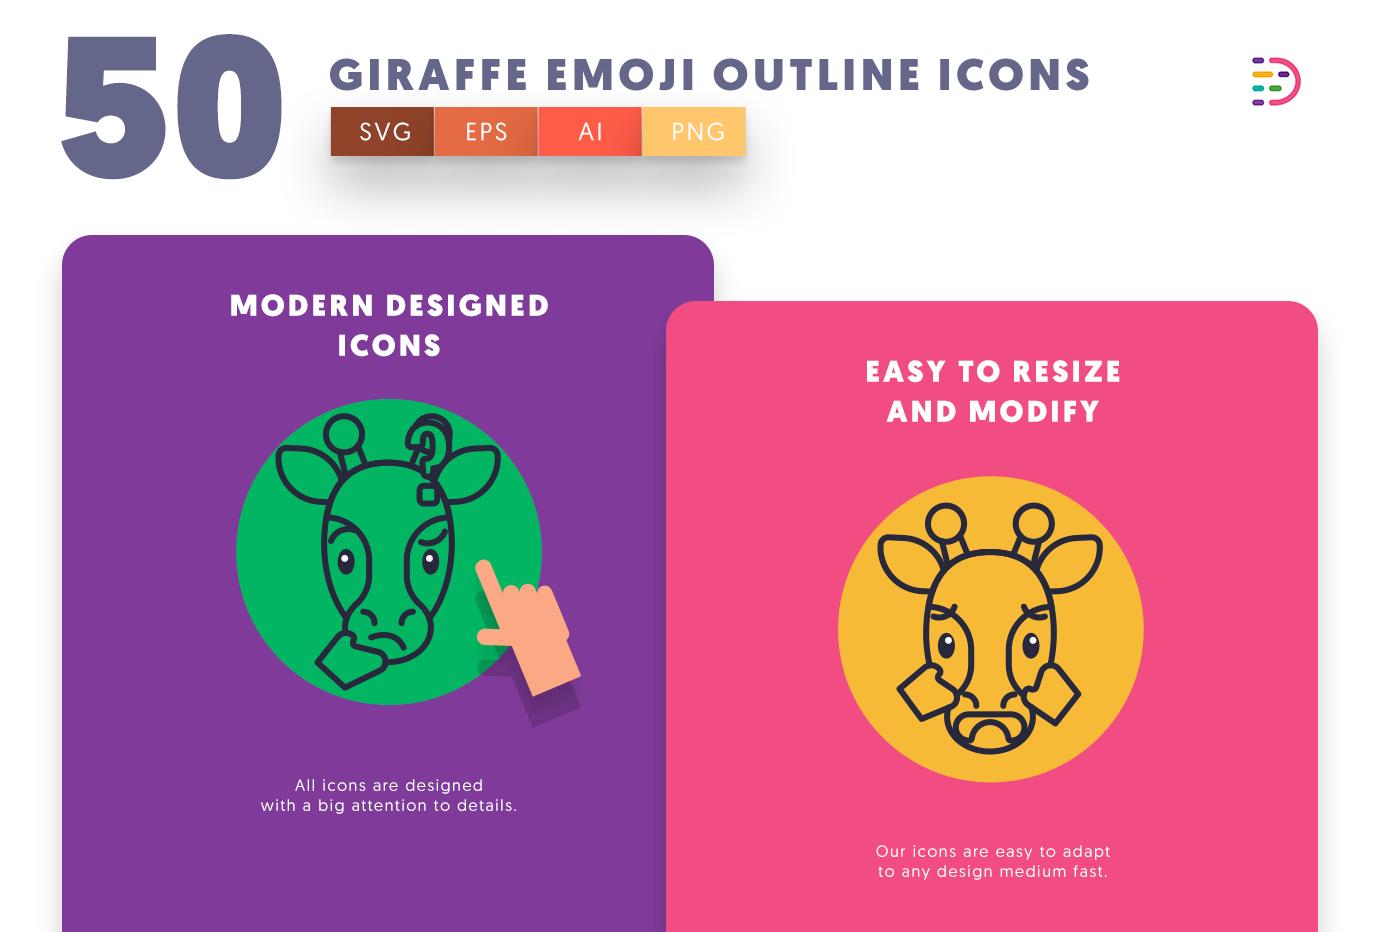 Giraffe Emoji Outline icons png/svg/eps